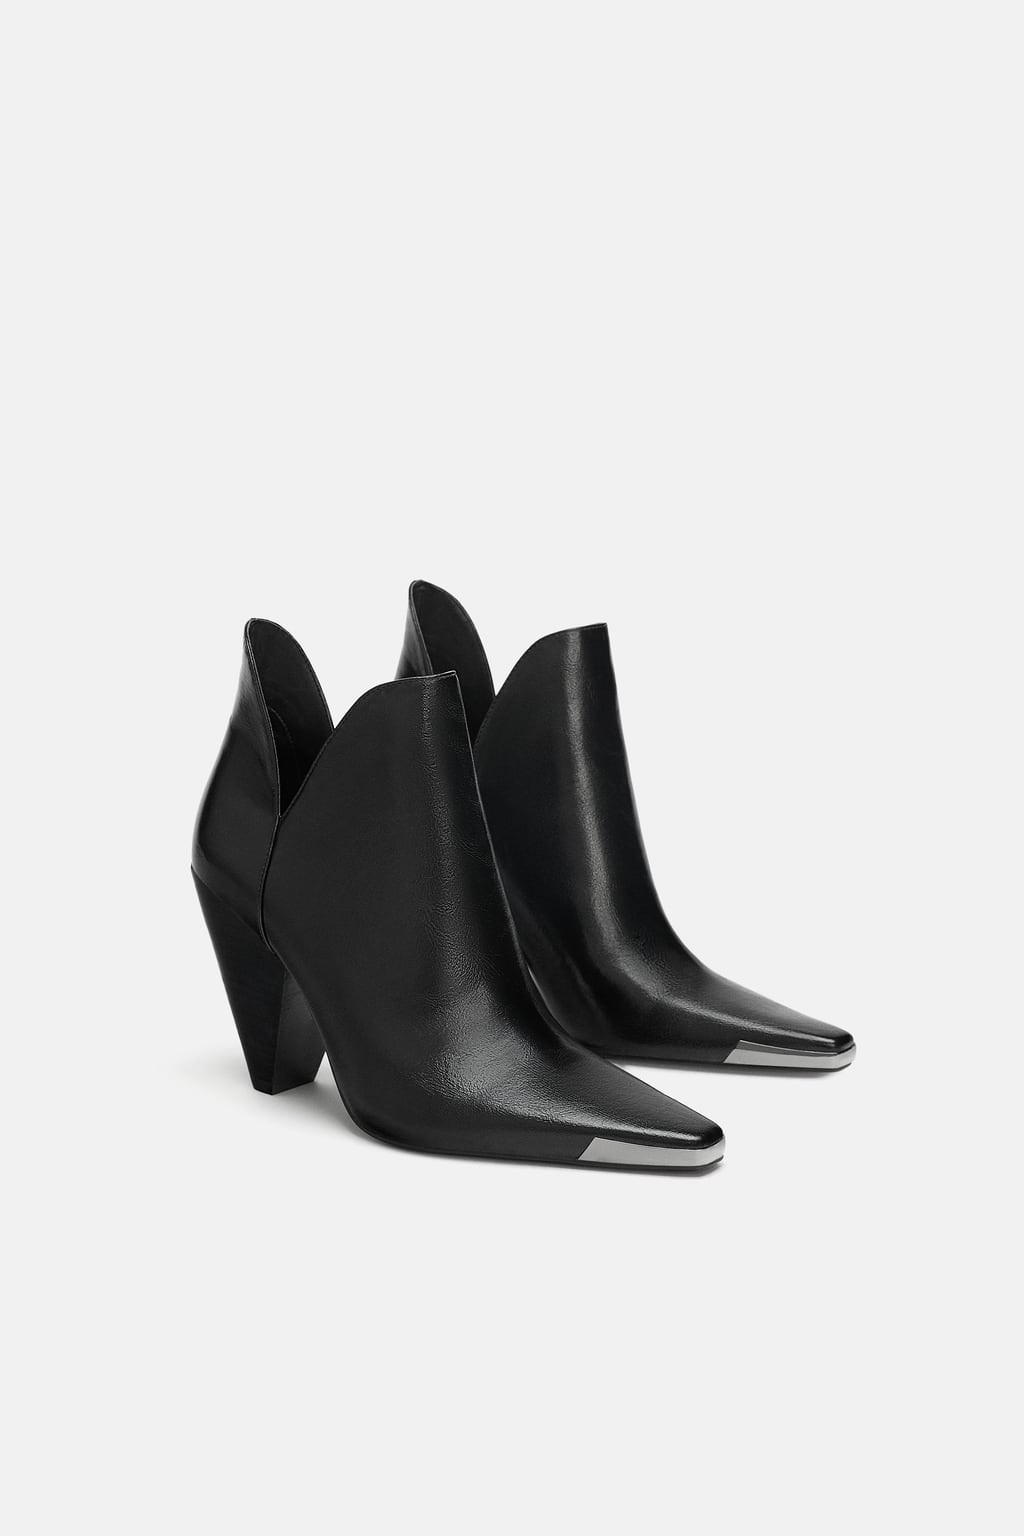 Zara western boots